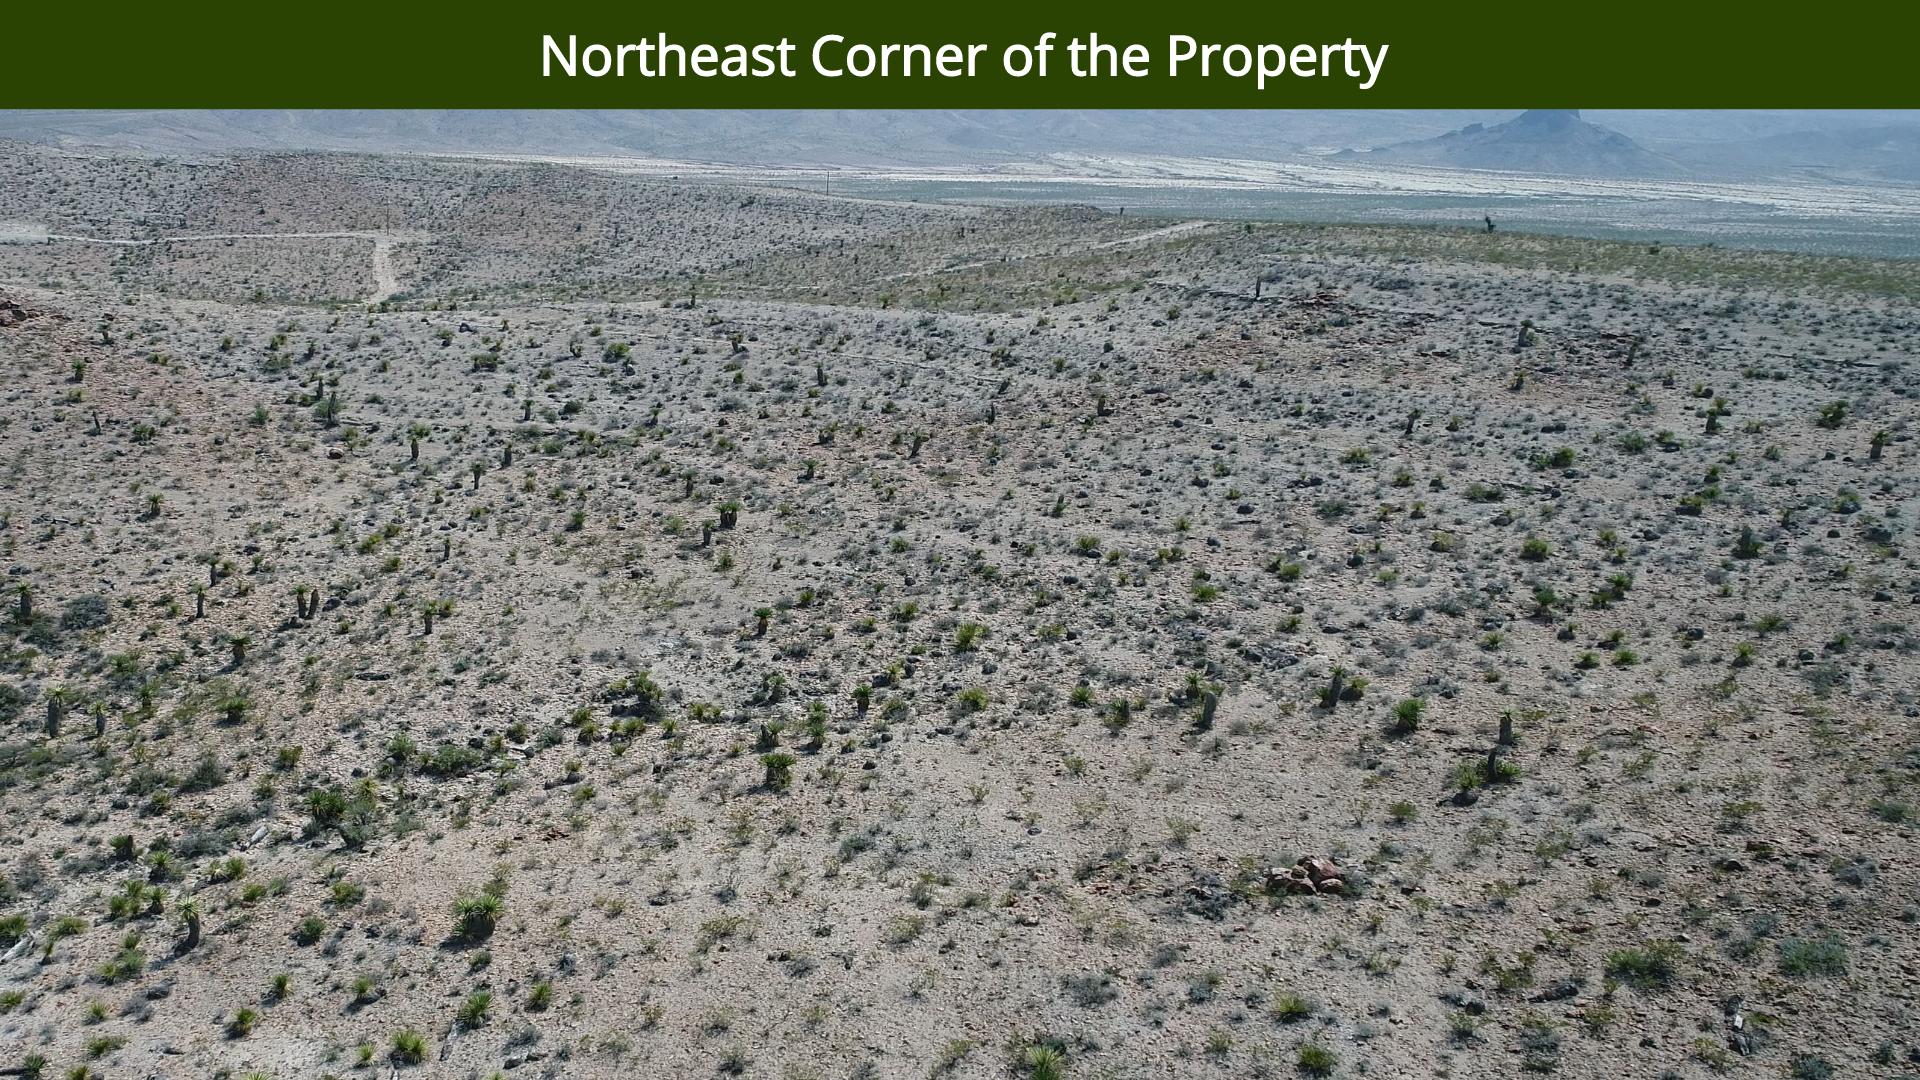 Northeast Corner of the Property